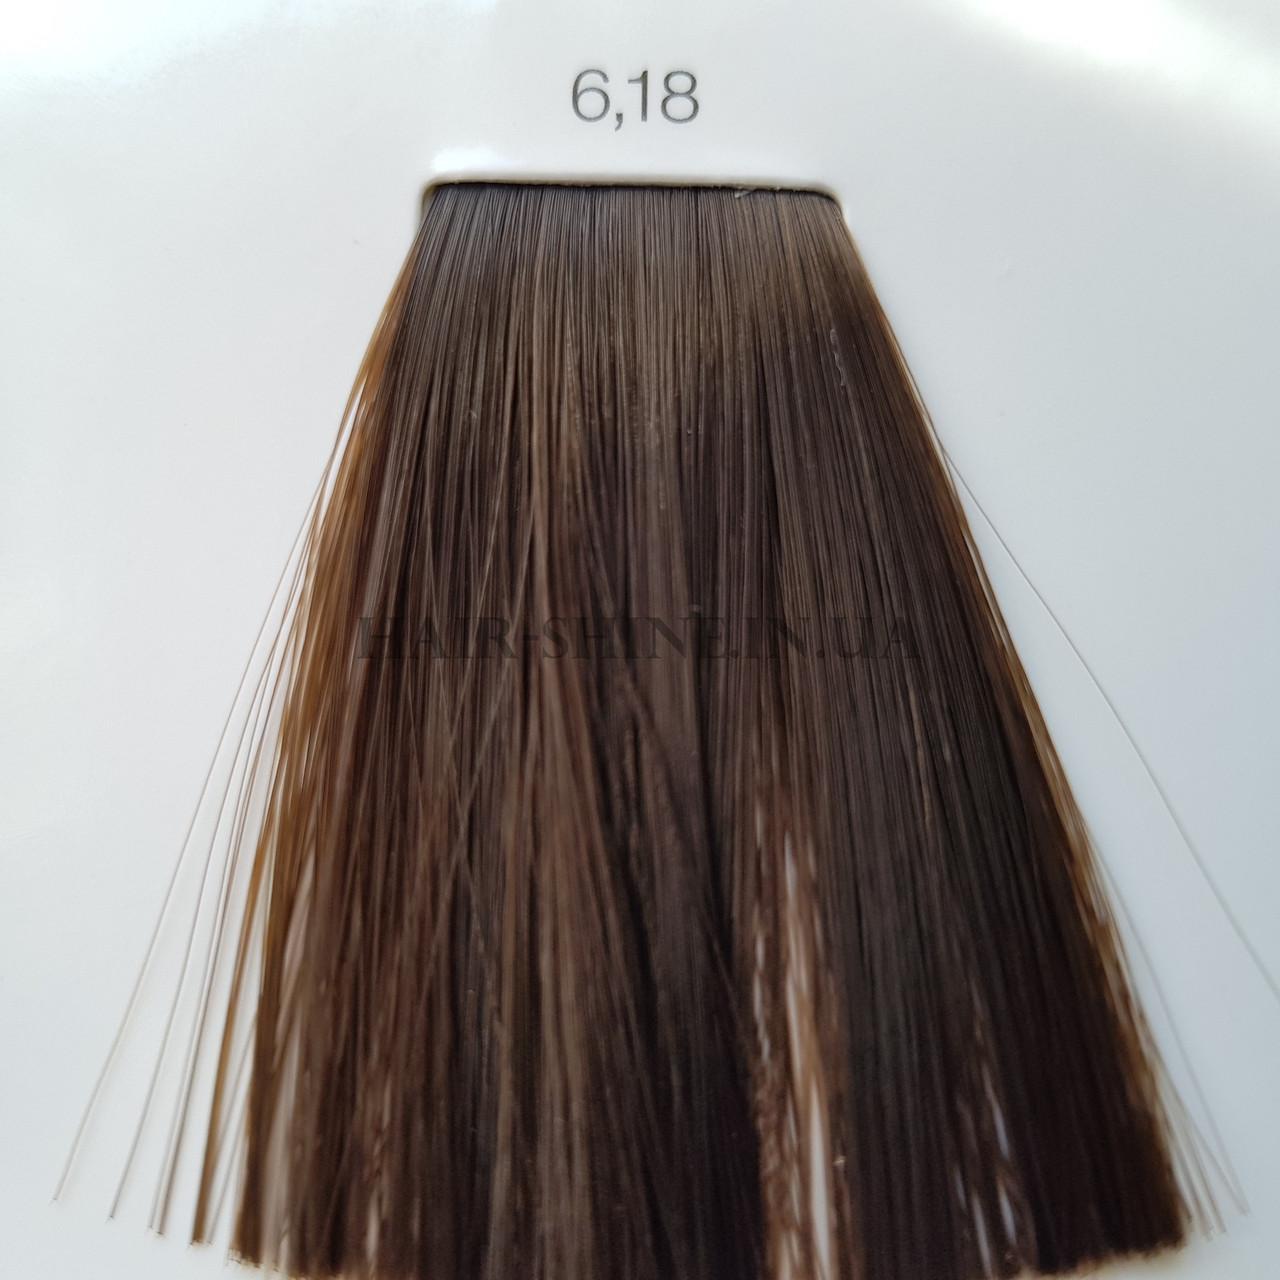 Краска без аммиака 60 мл  L'Oreal Professionnel Inoa 6.18  темный блондин пепельный мокка